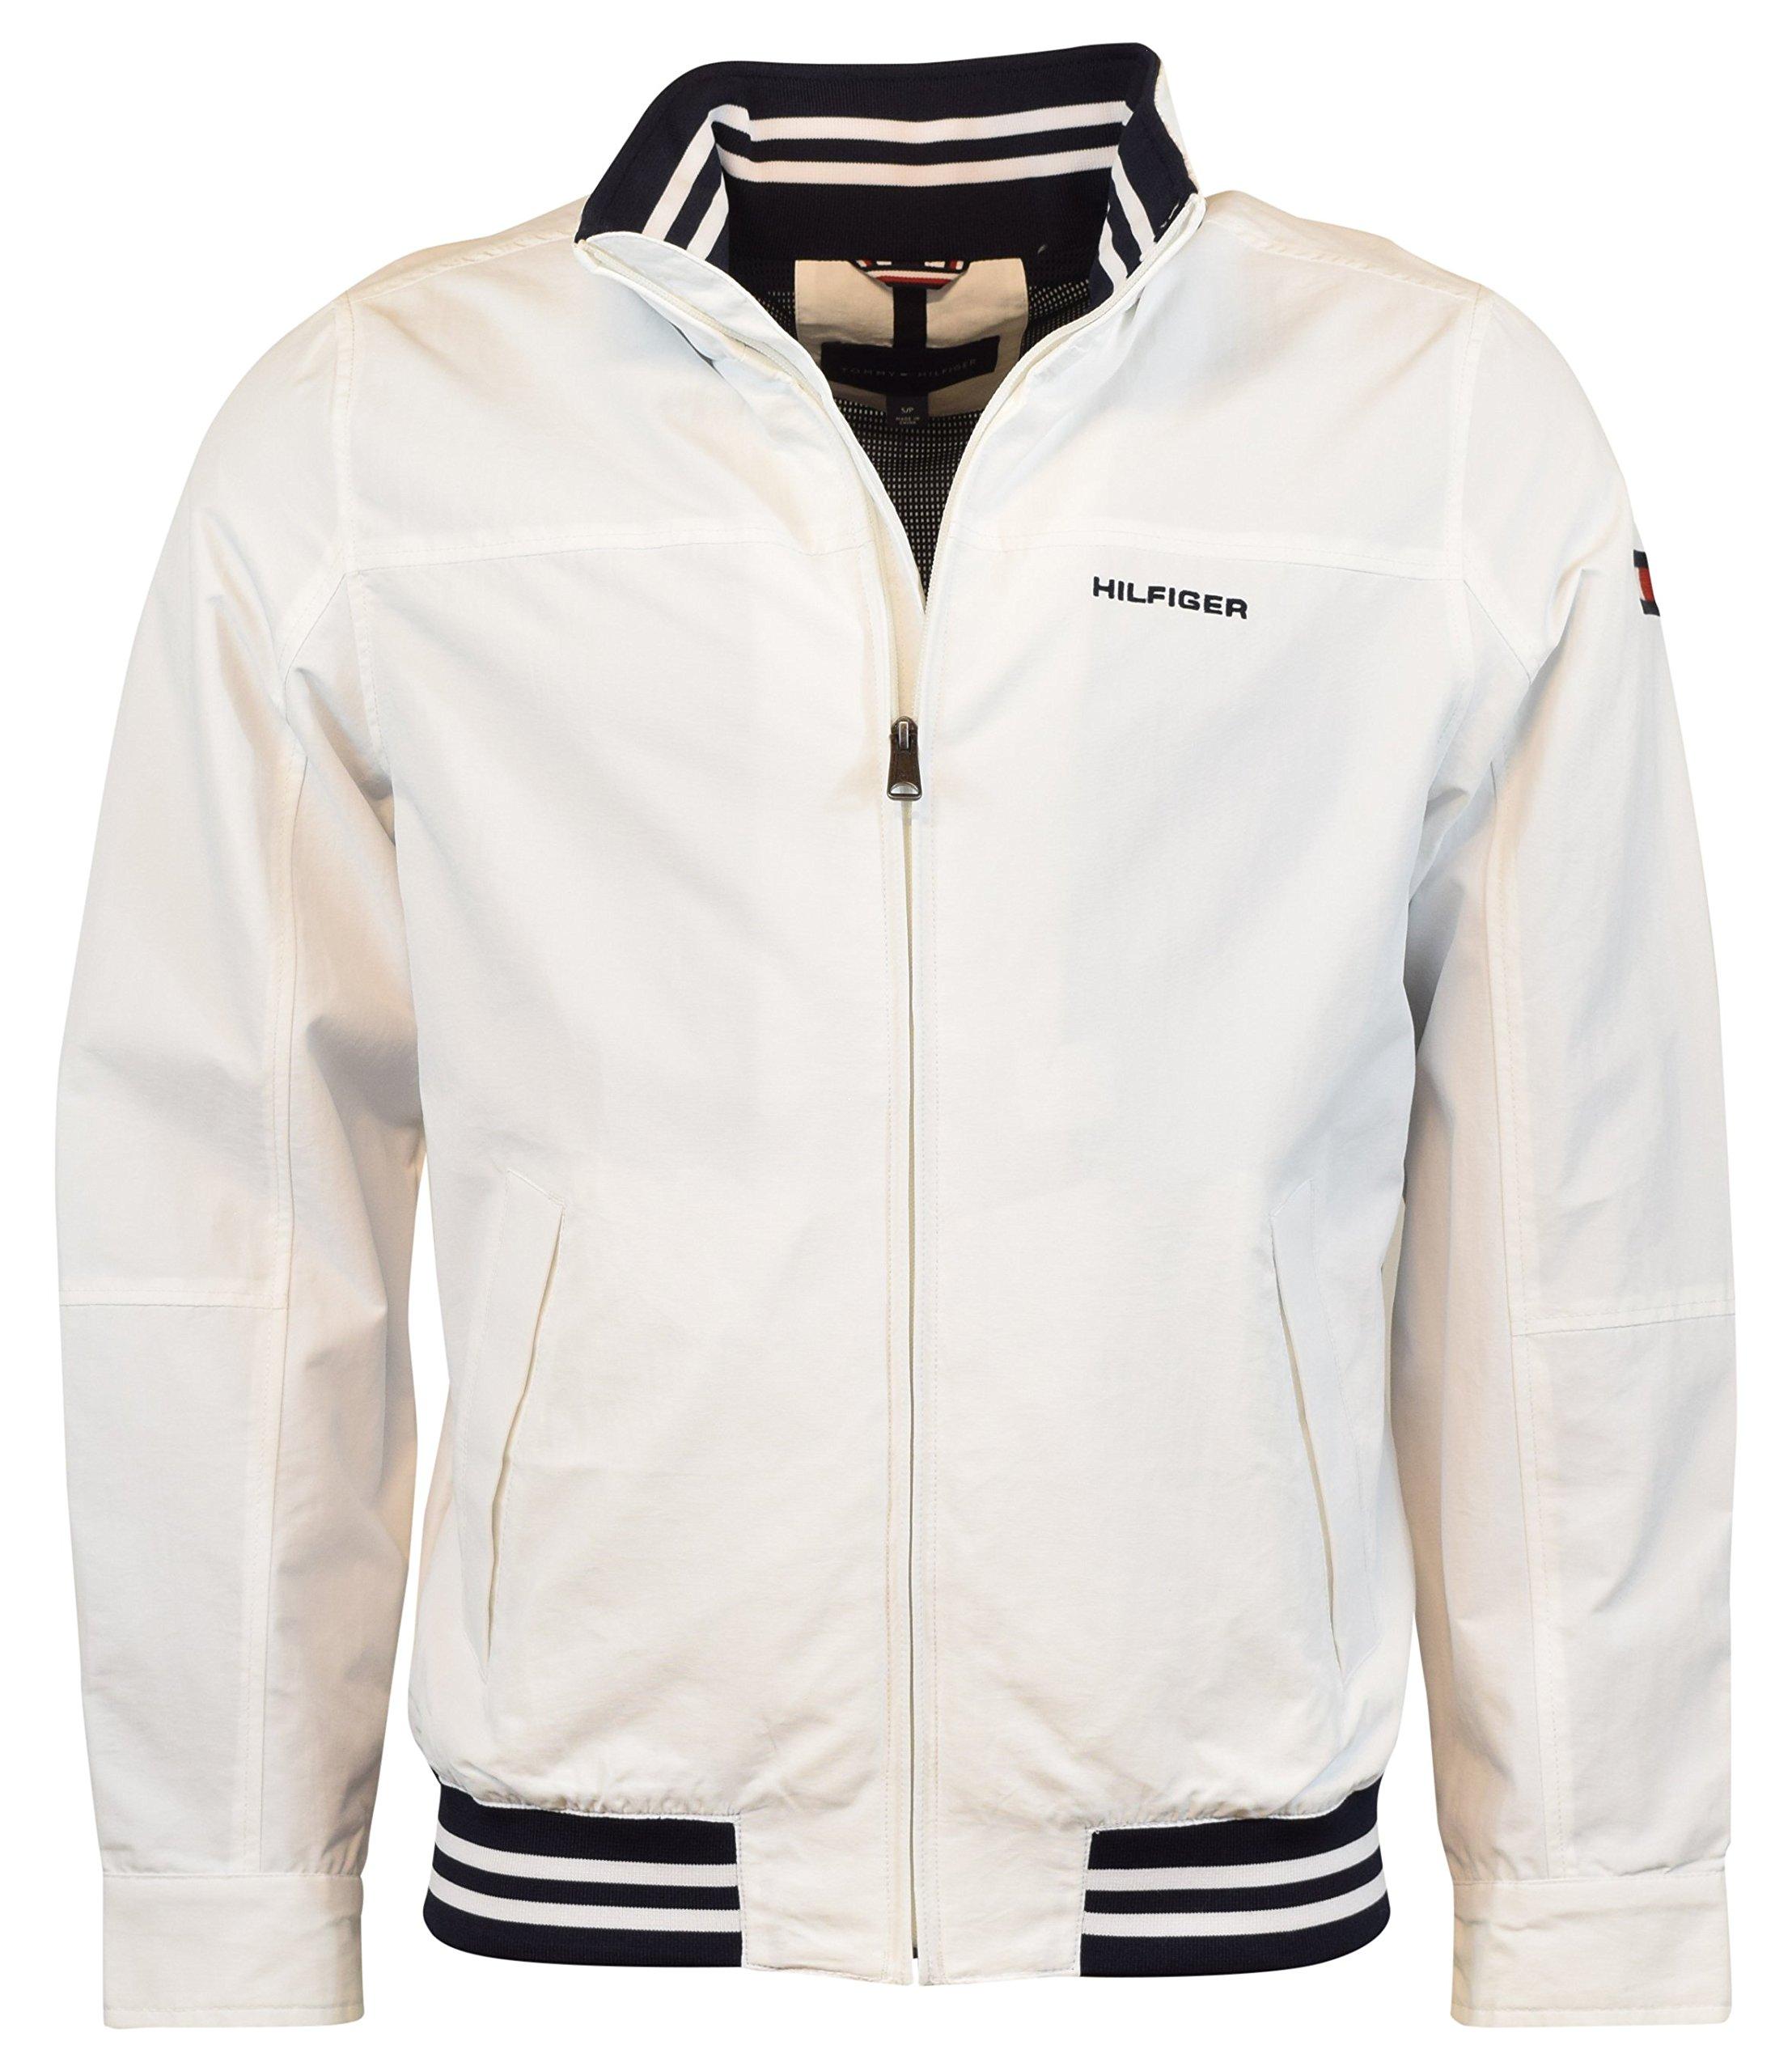 Galleon - Tommy Hilfiger Men s Regatta Jacket 5208a91cb9735